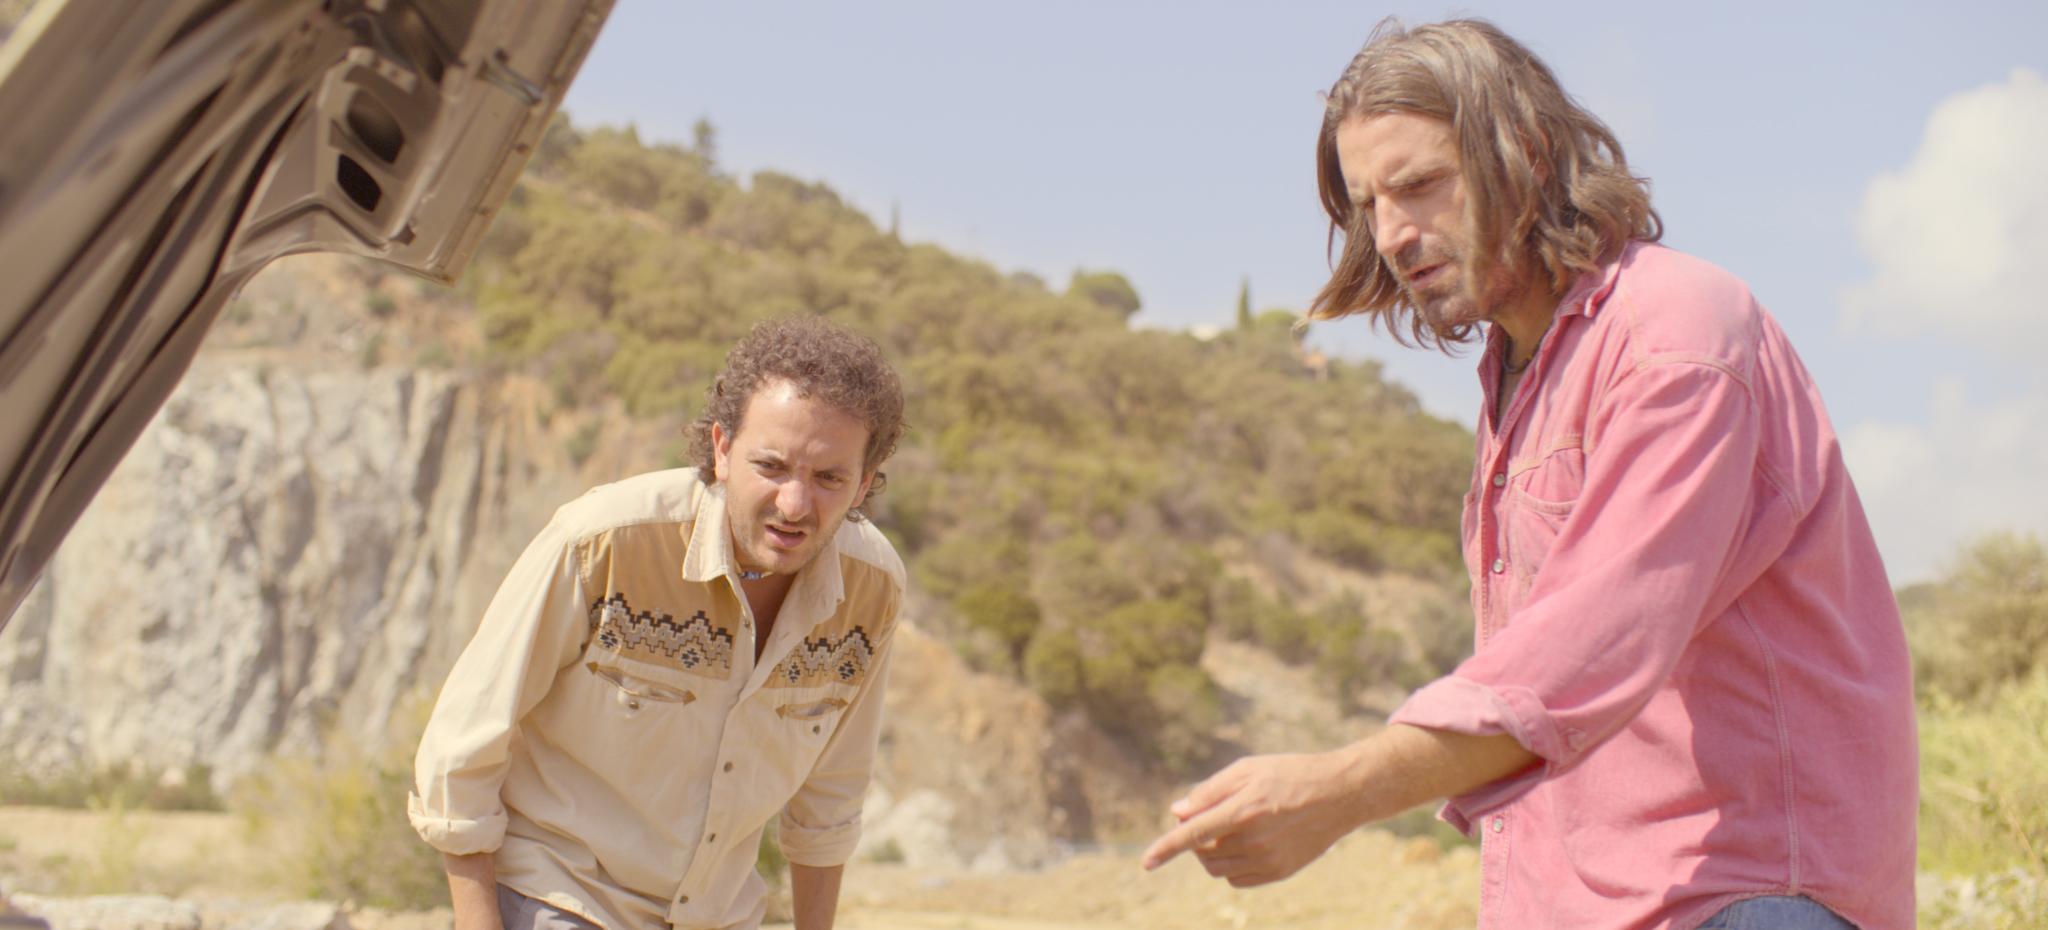 David Marsais e Grégoire Luding in Mandibules